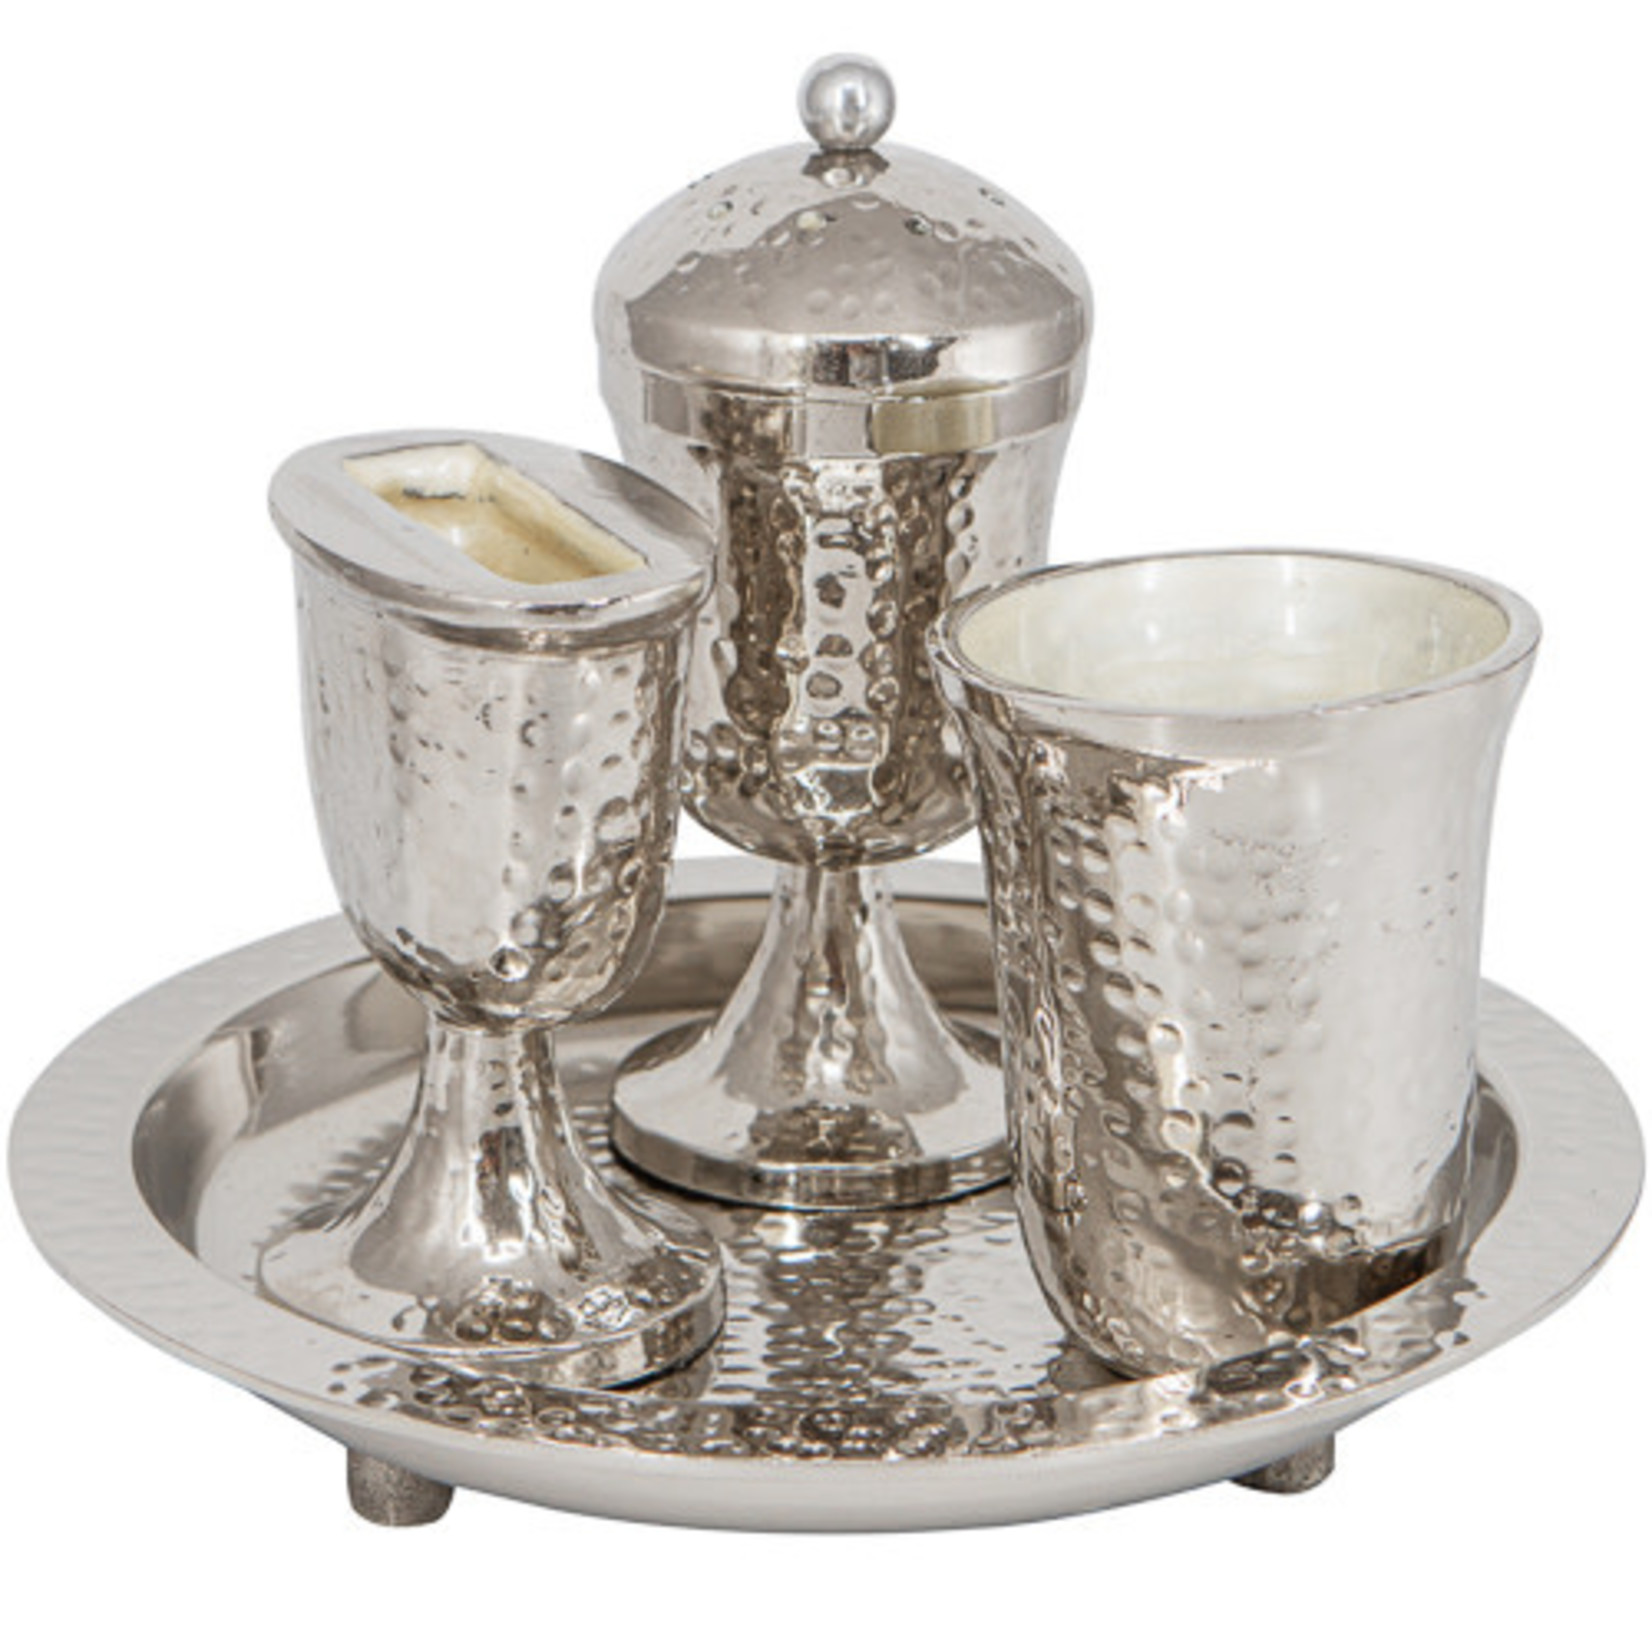 Havdallah Set, Aluminum